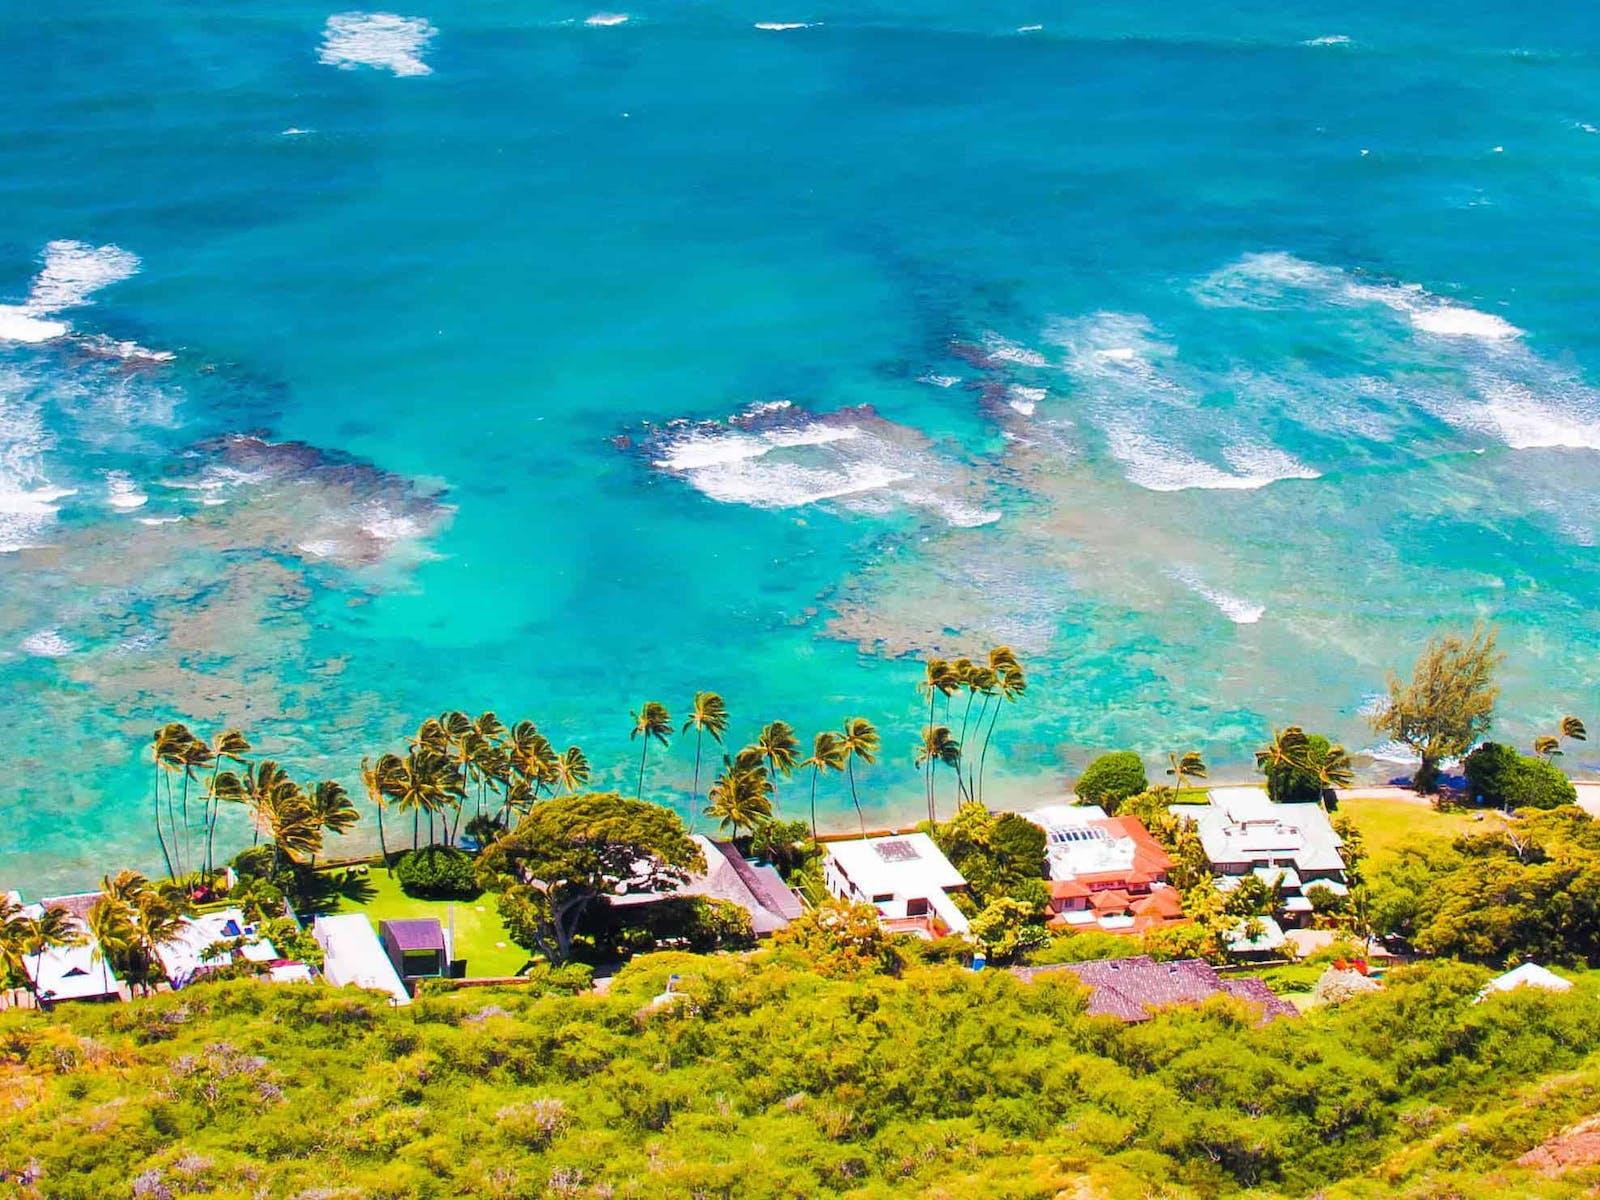 Palm trees and ocean views in north Kona, Hawaii